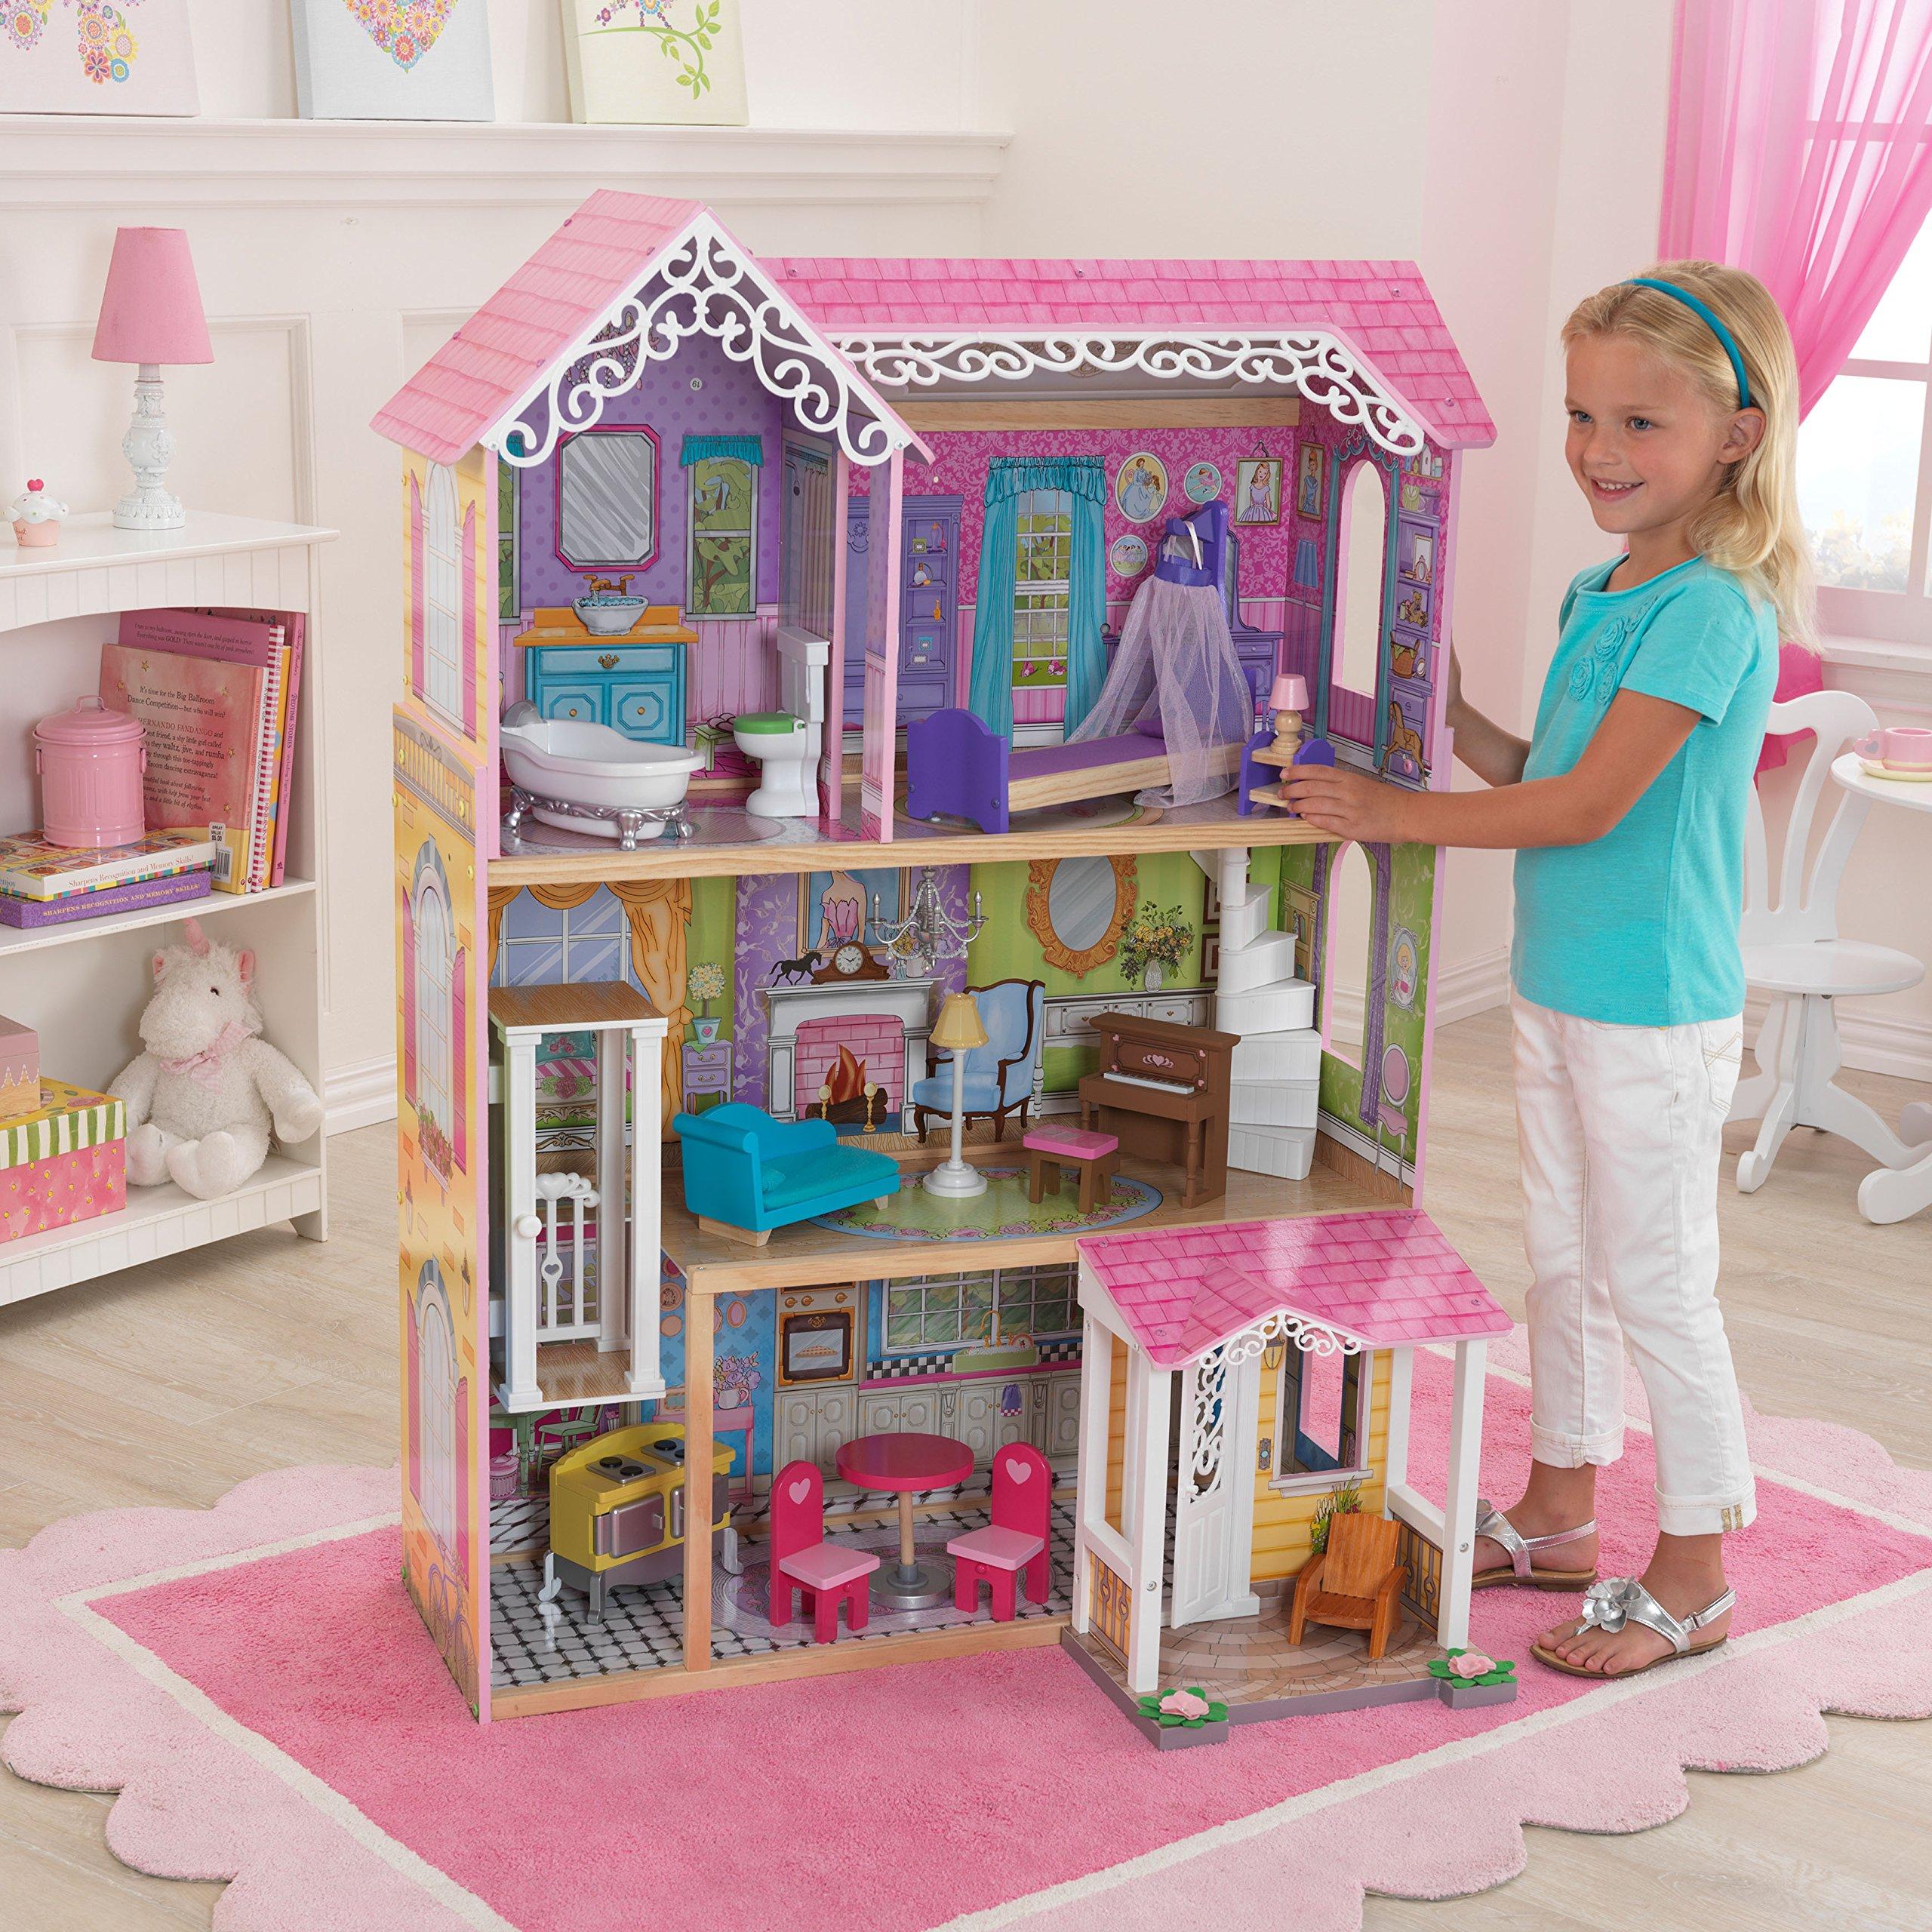 KidKraft Sweet & Pretty Dollhouse Toy by KidKraft (Image #2)